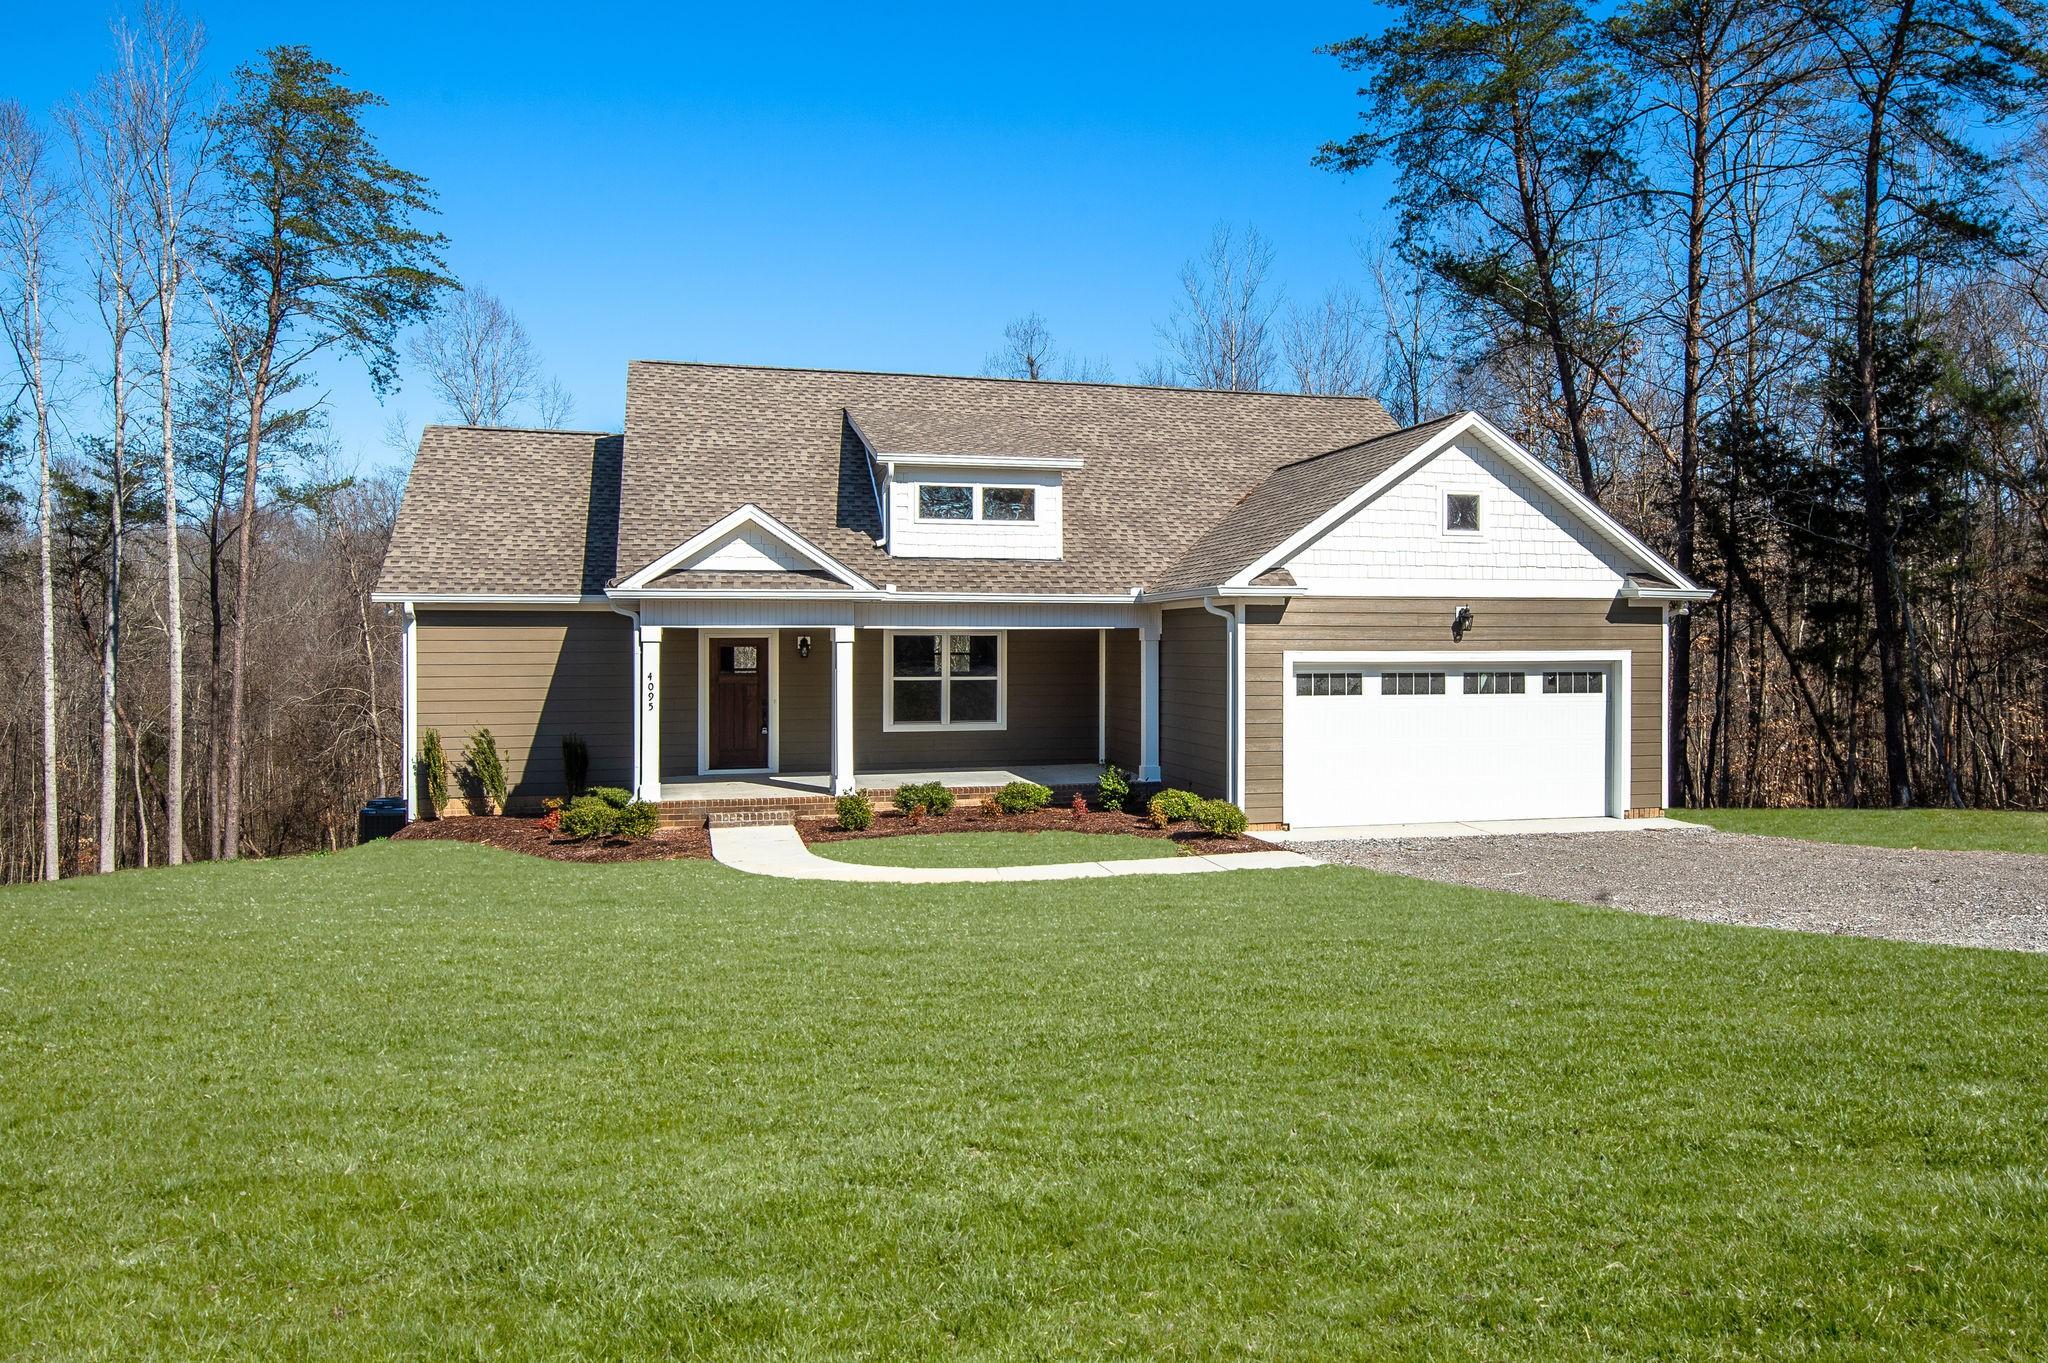 4095 Highway 96 (Lot 2), Burns, TN 37029 - Burns, TN real estate listing